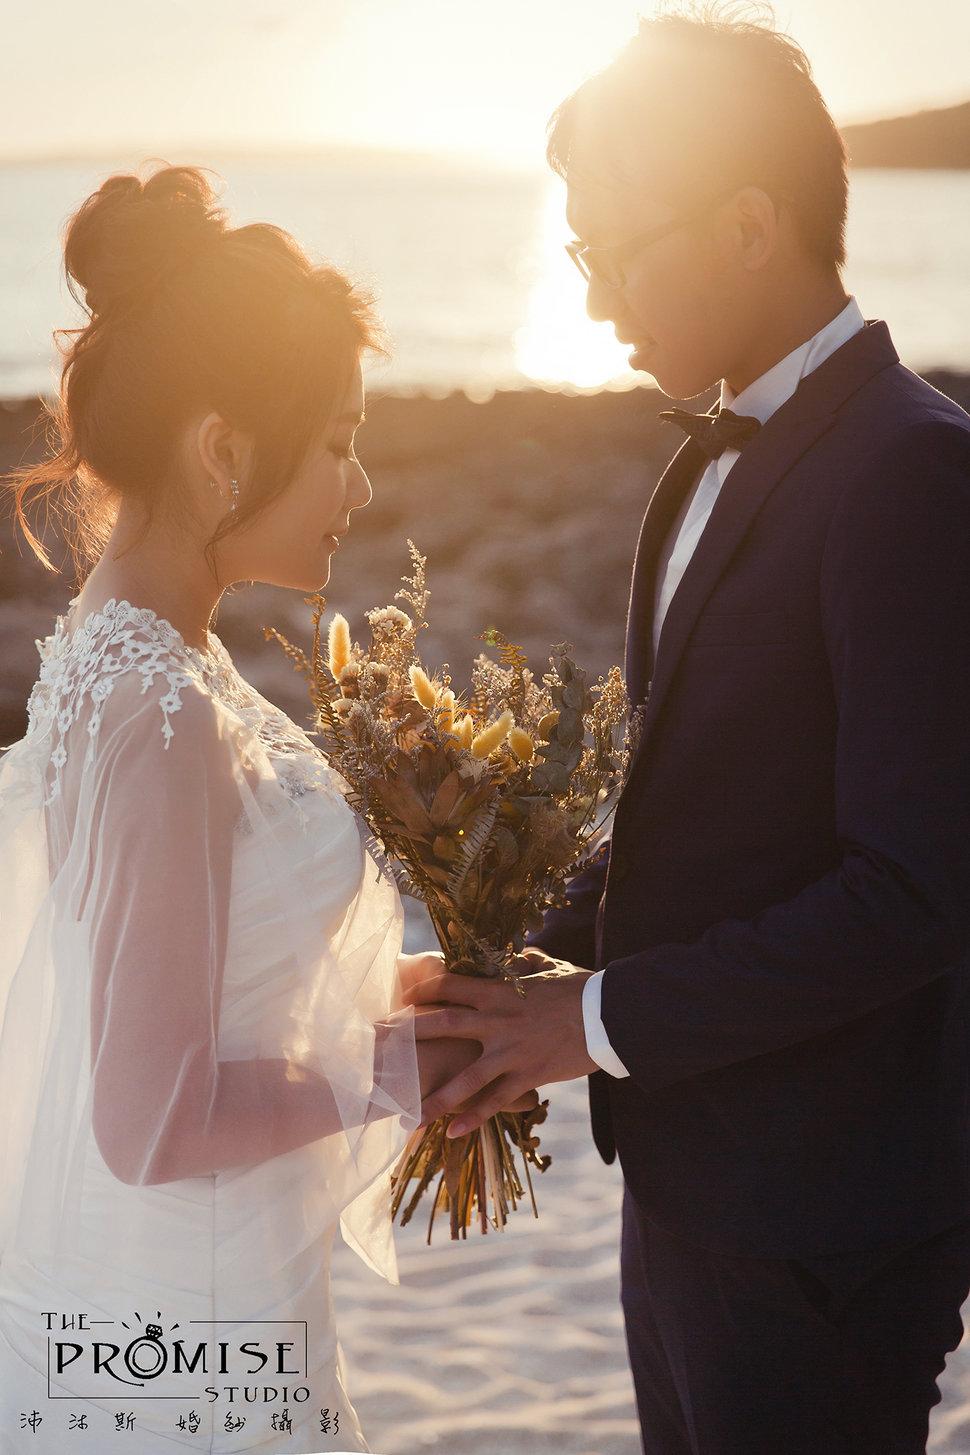 IMG_0286 - 沛沐斯婚紗攝影 - 結婚吧